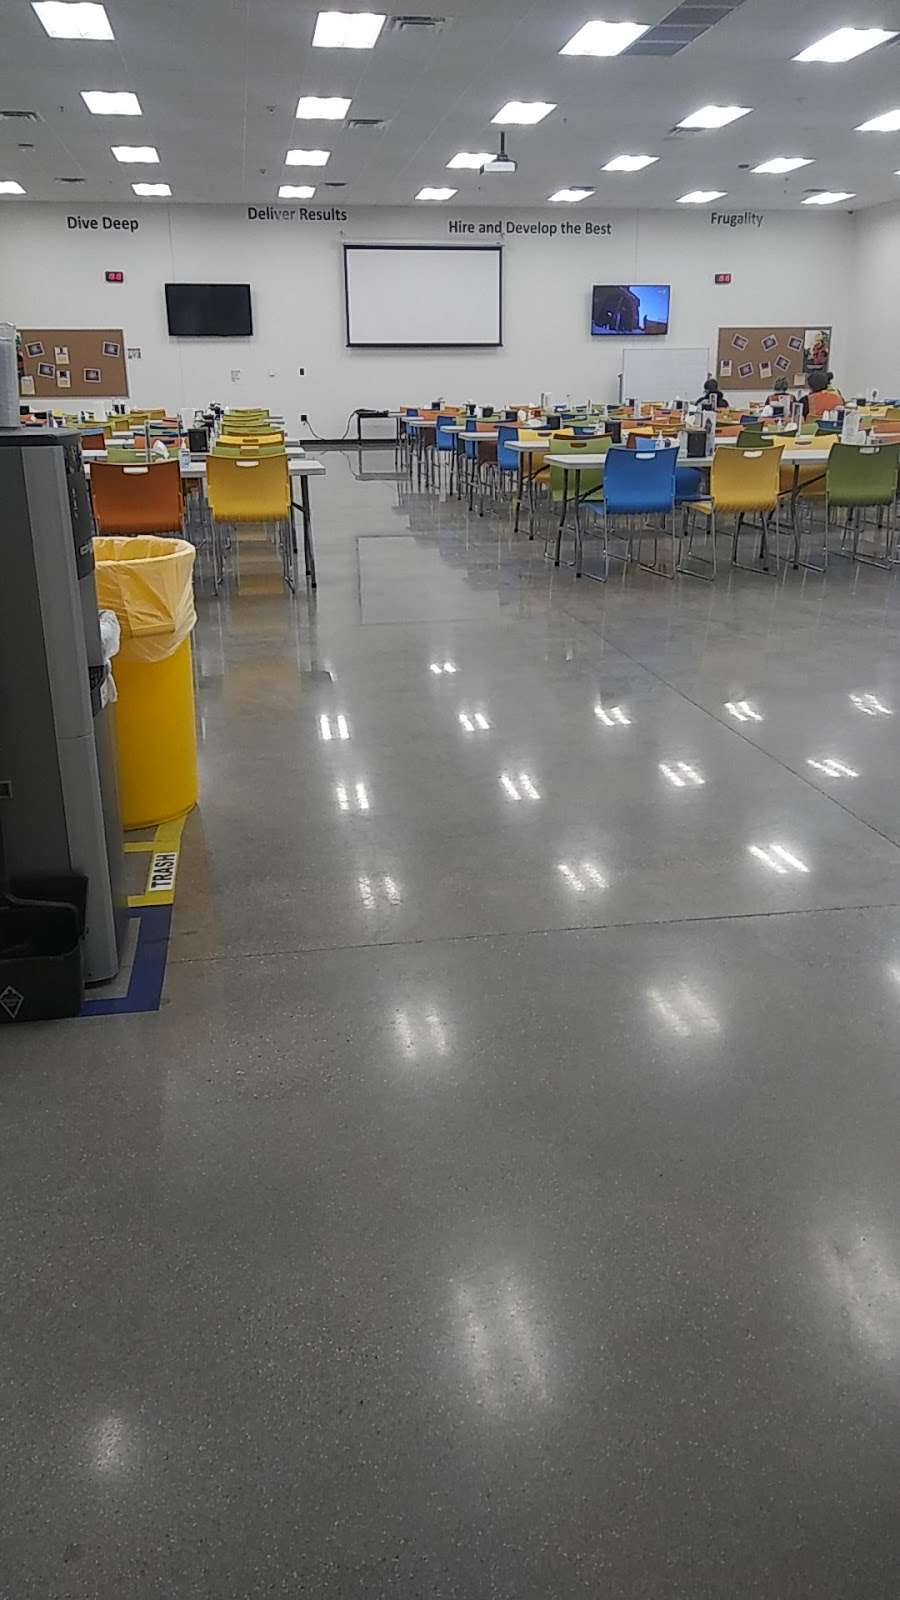 Amazon Sort Center - MDW5 - storage  | Photo 6 of 10 | Address: 16825 Churnovic Lane, Crest Hill, IL 60435, USA | Phone: (855) 728-4131